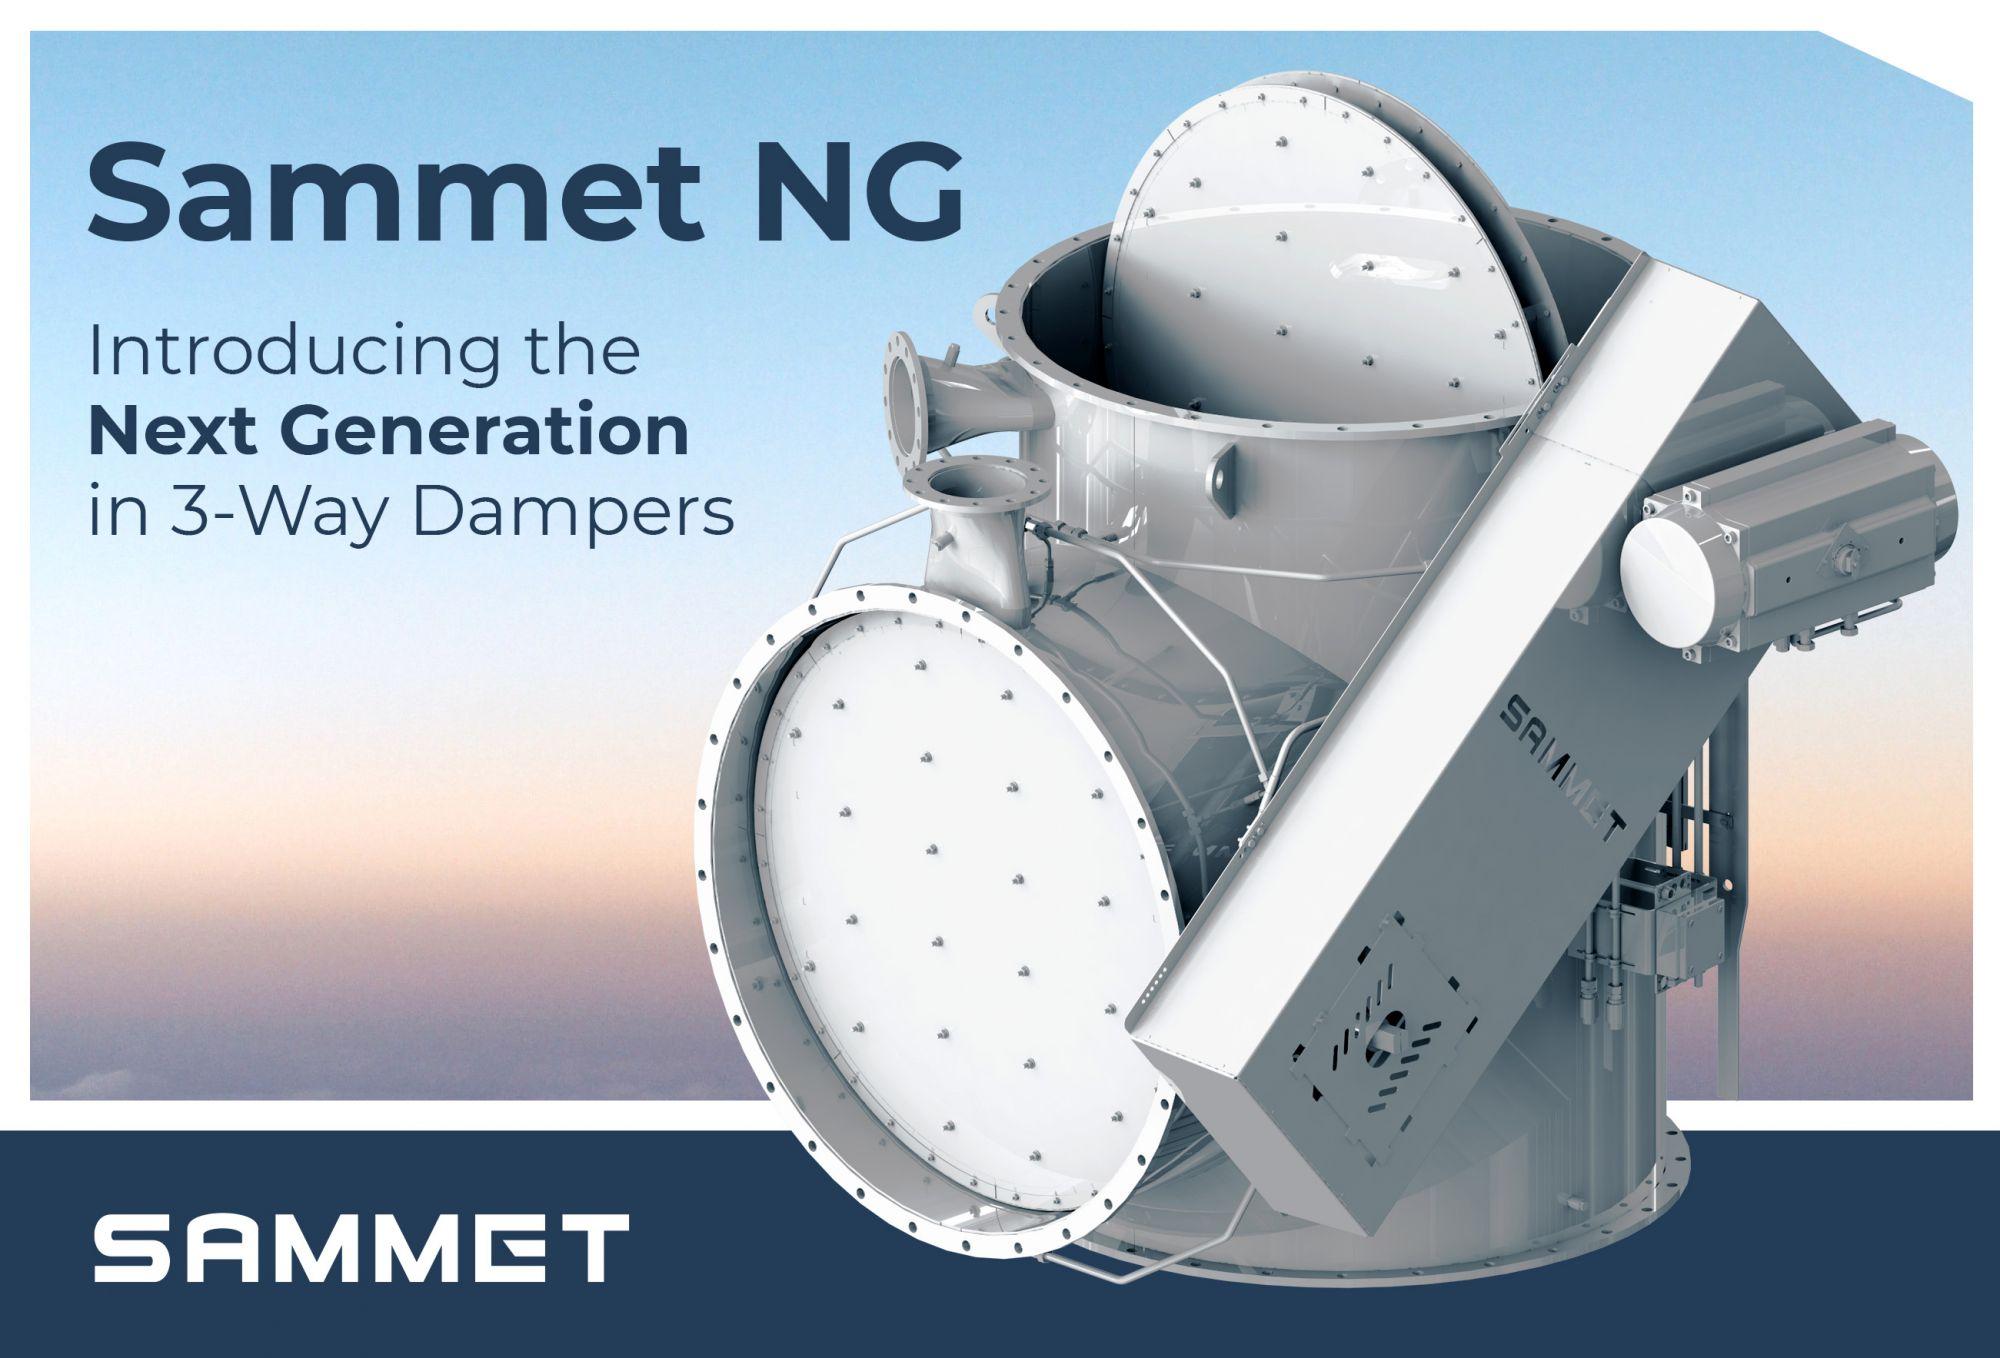 The Next Generation - Sammet NG 3-Way Dampers